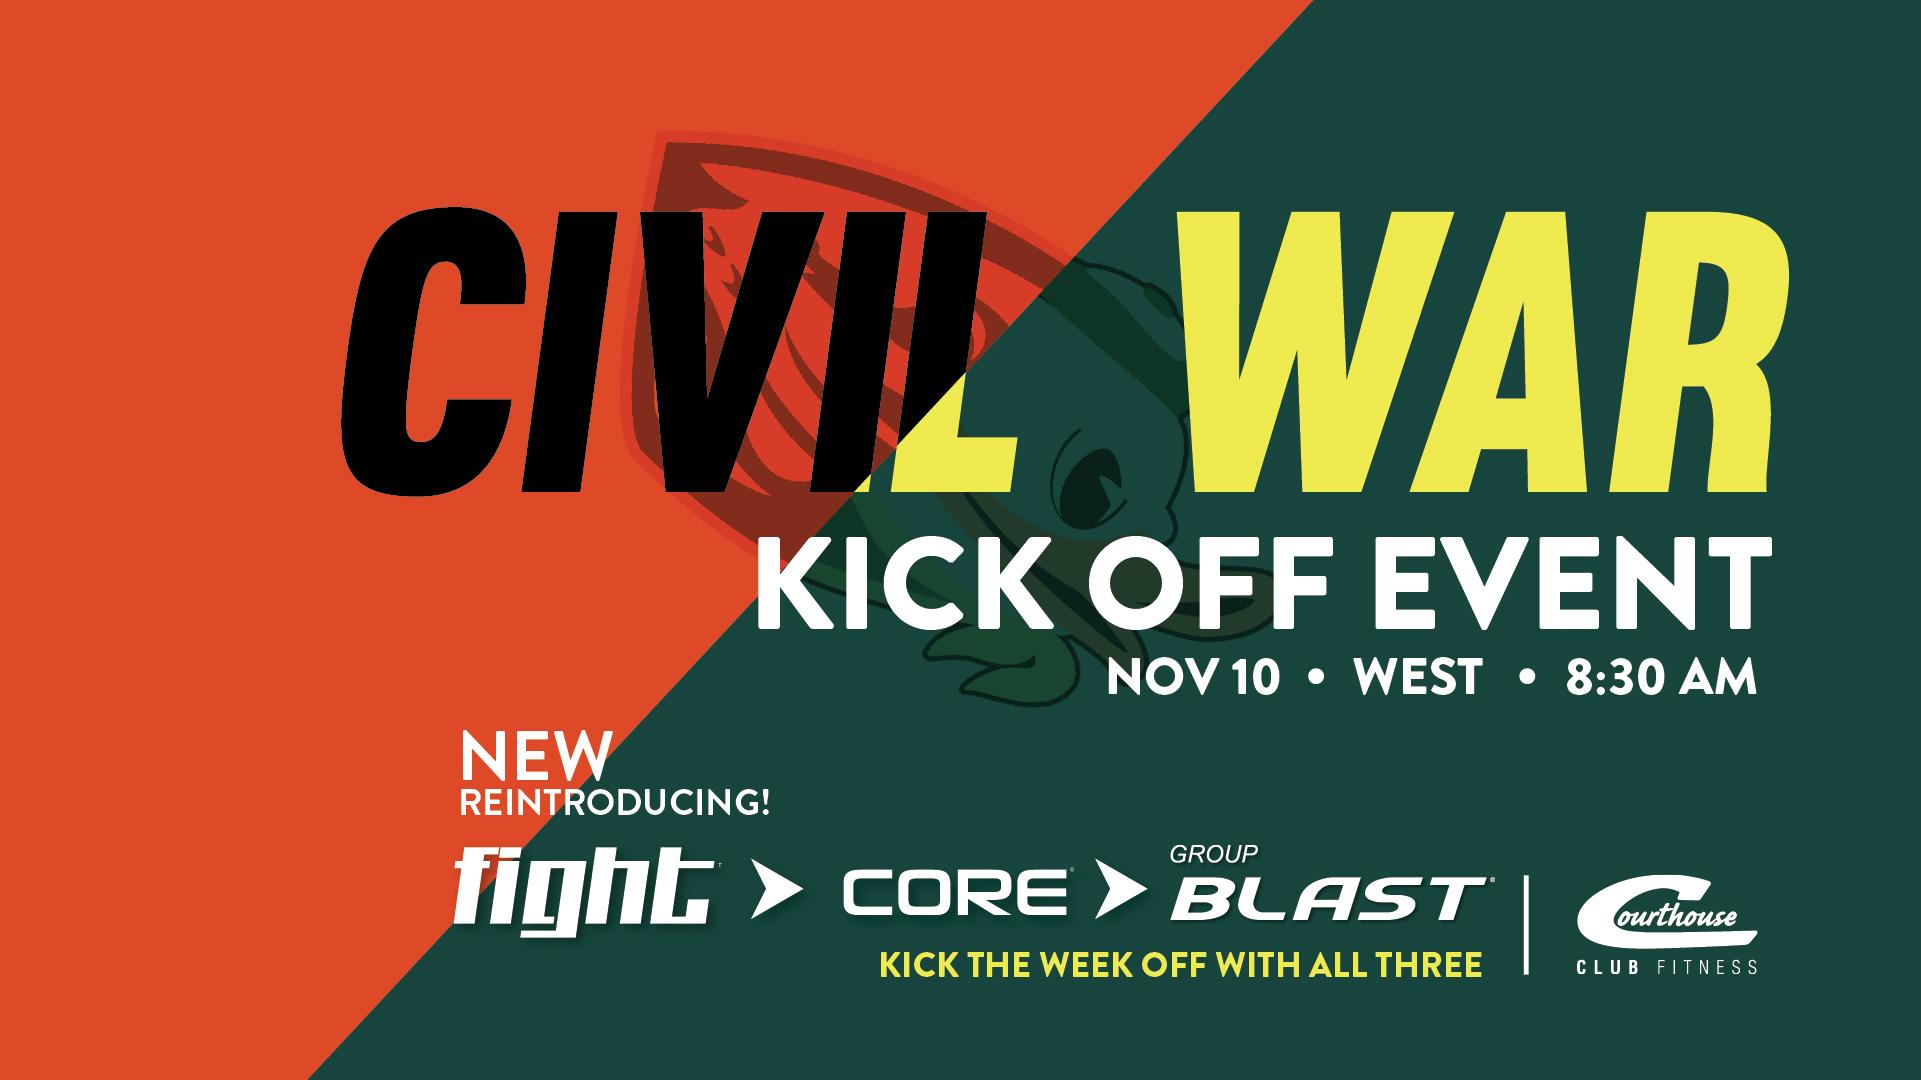 Civil_War_2018-02.jpg